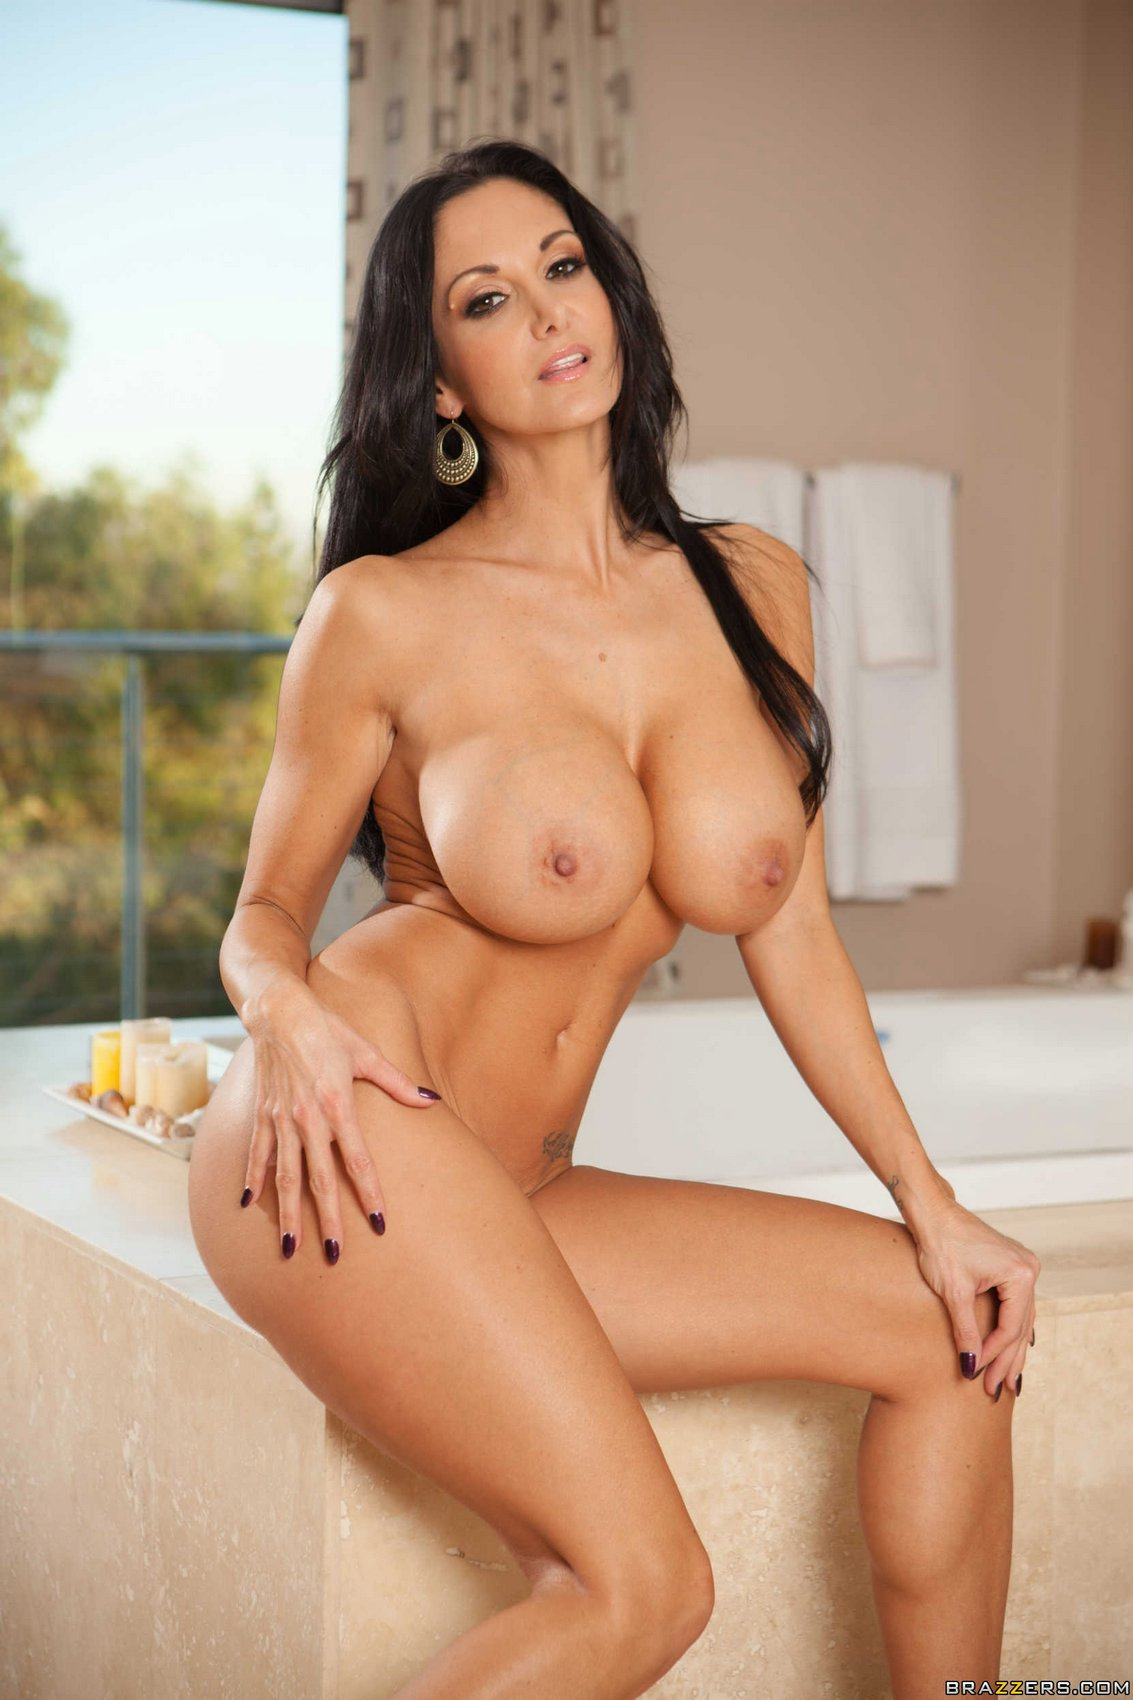 Remarkable Big tit pornstars posing nude can